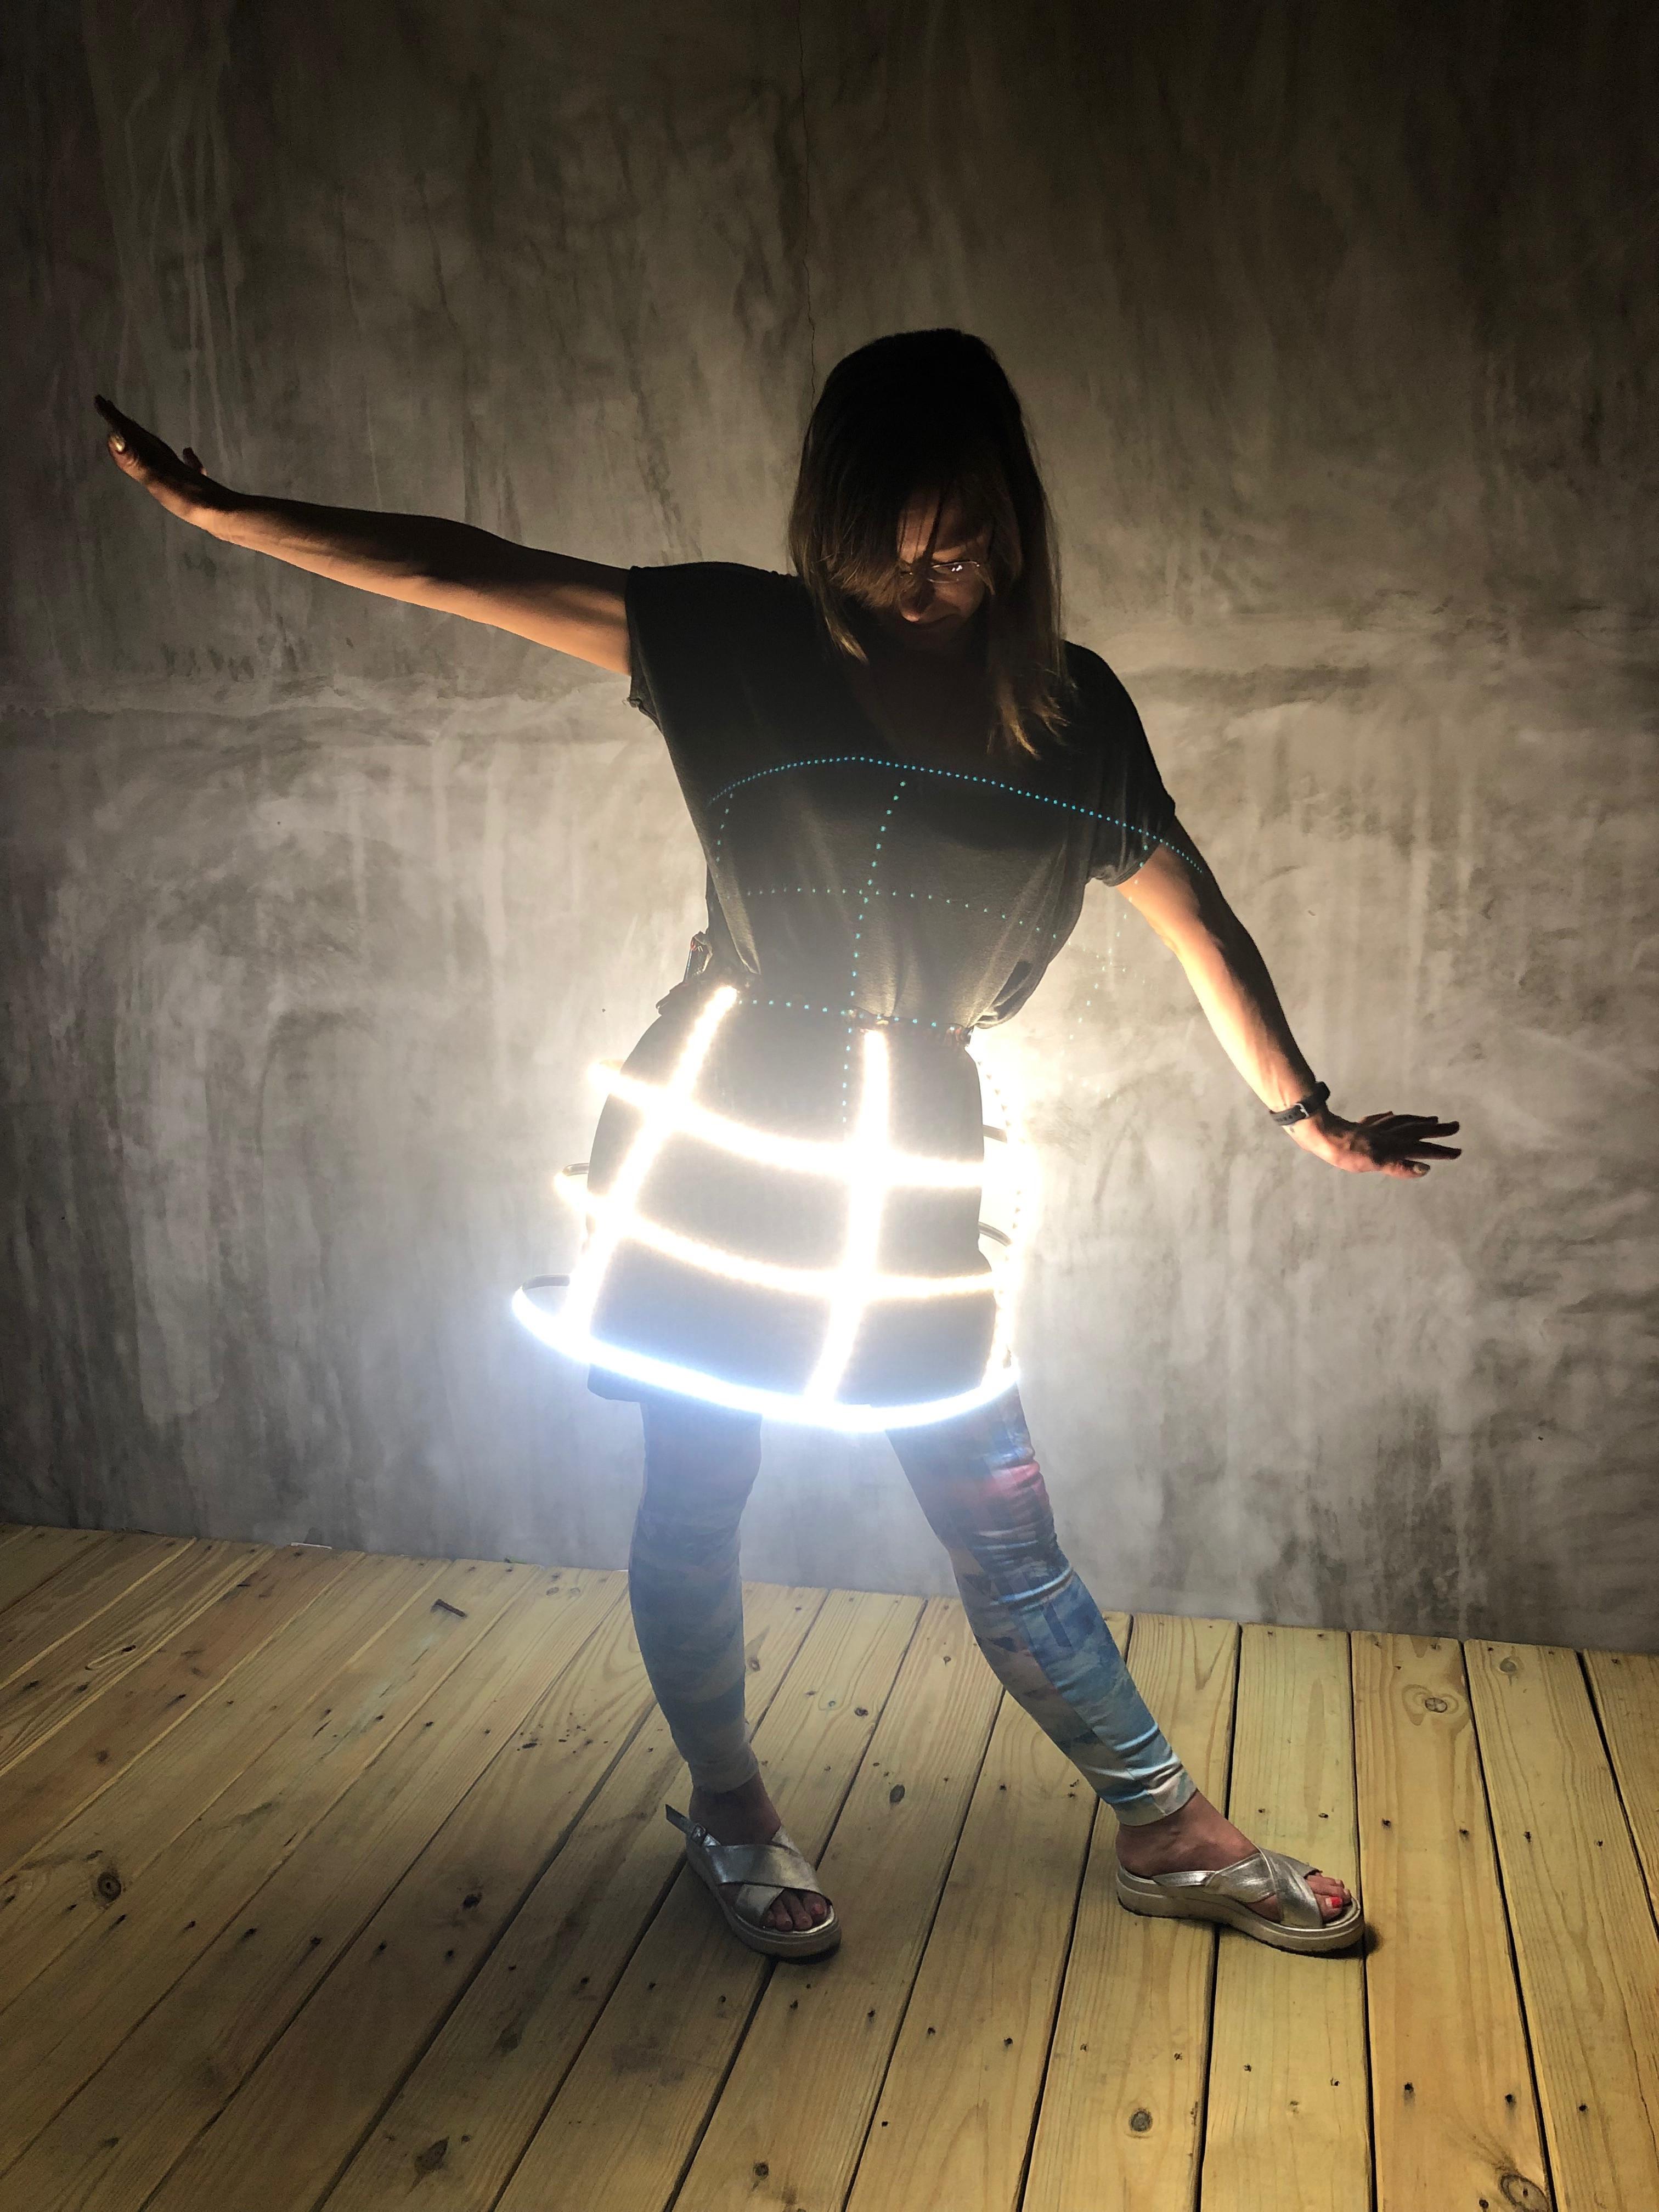 Advanced Illuminated Skirt Workshop